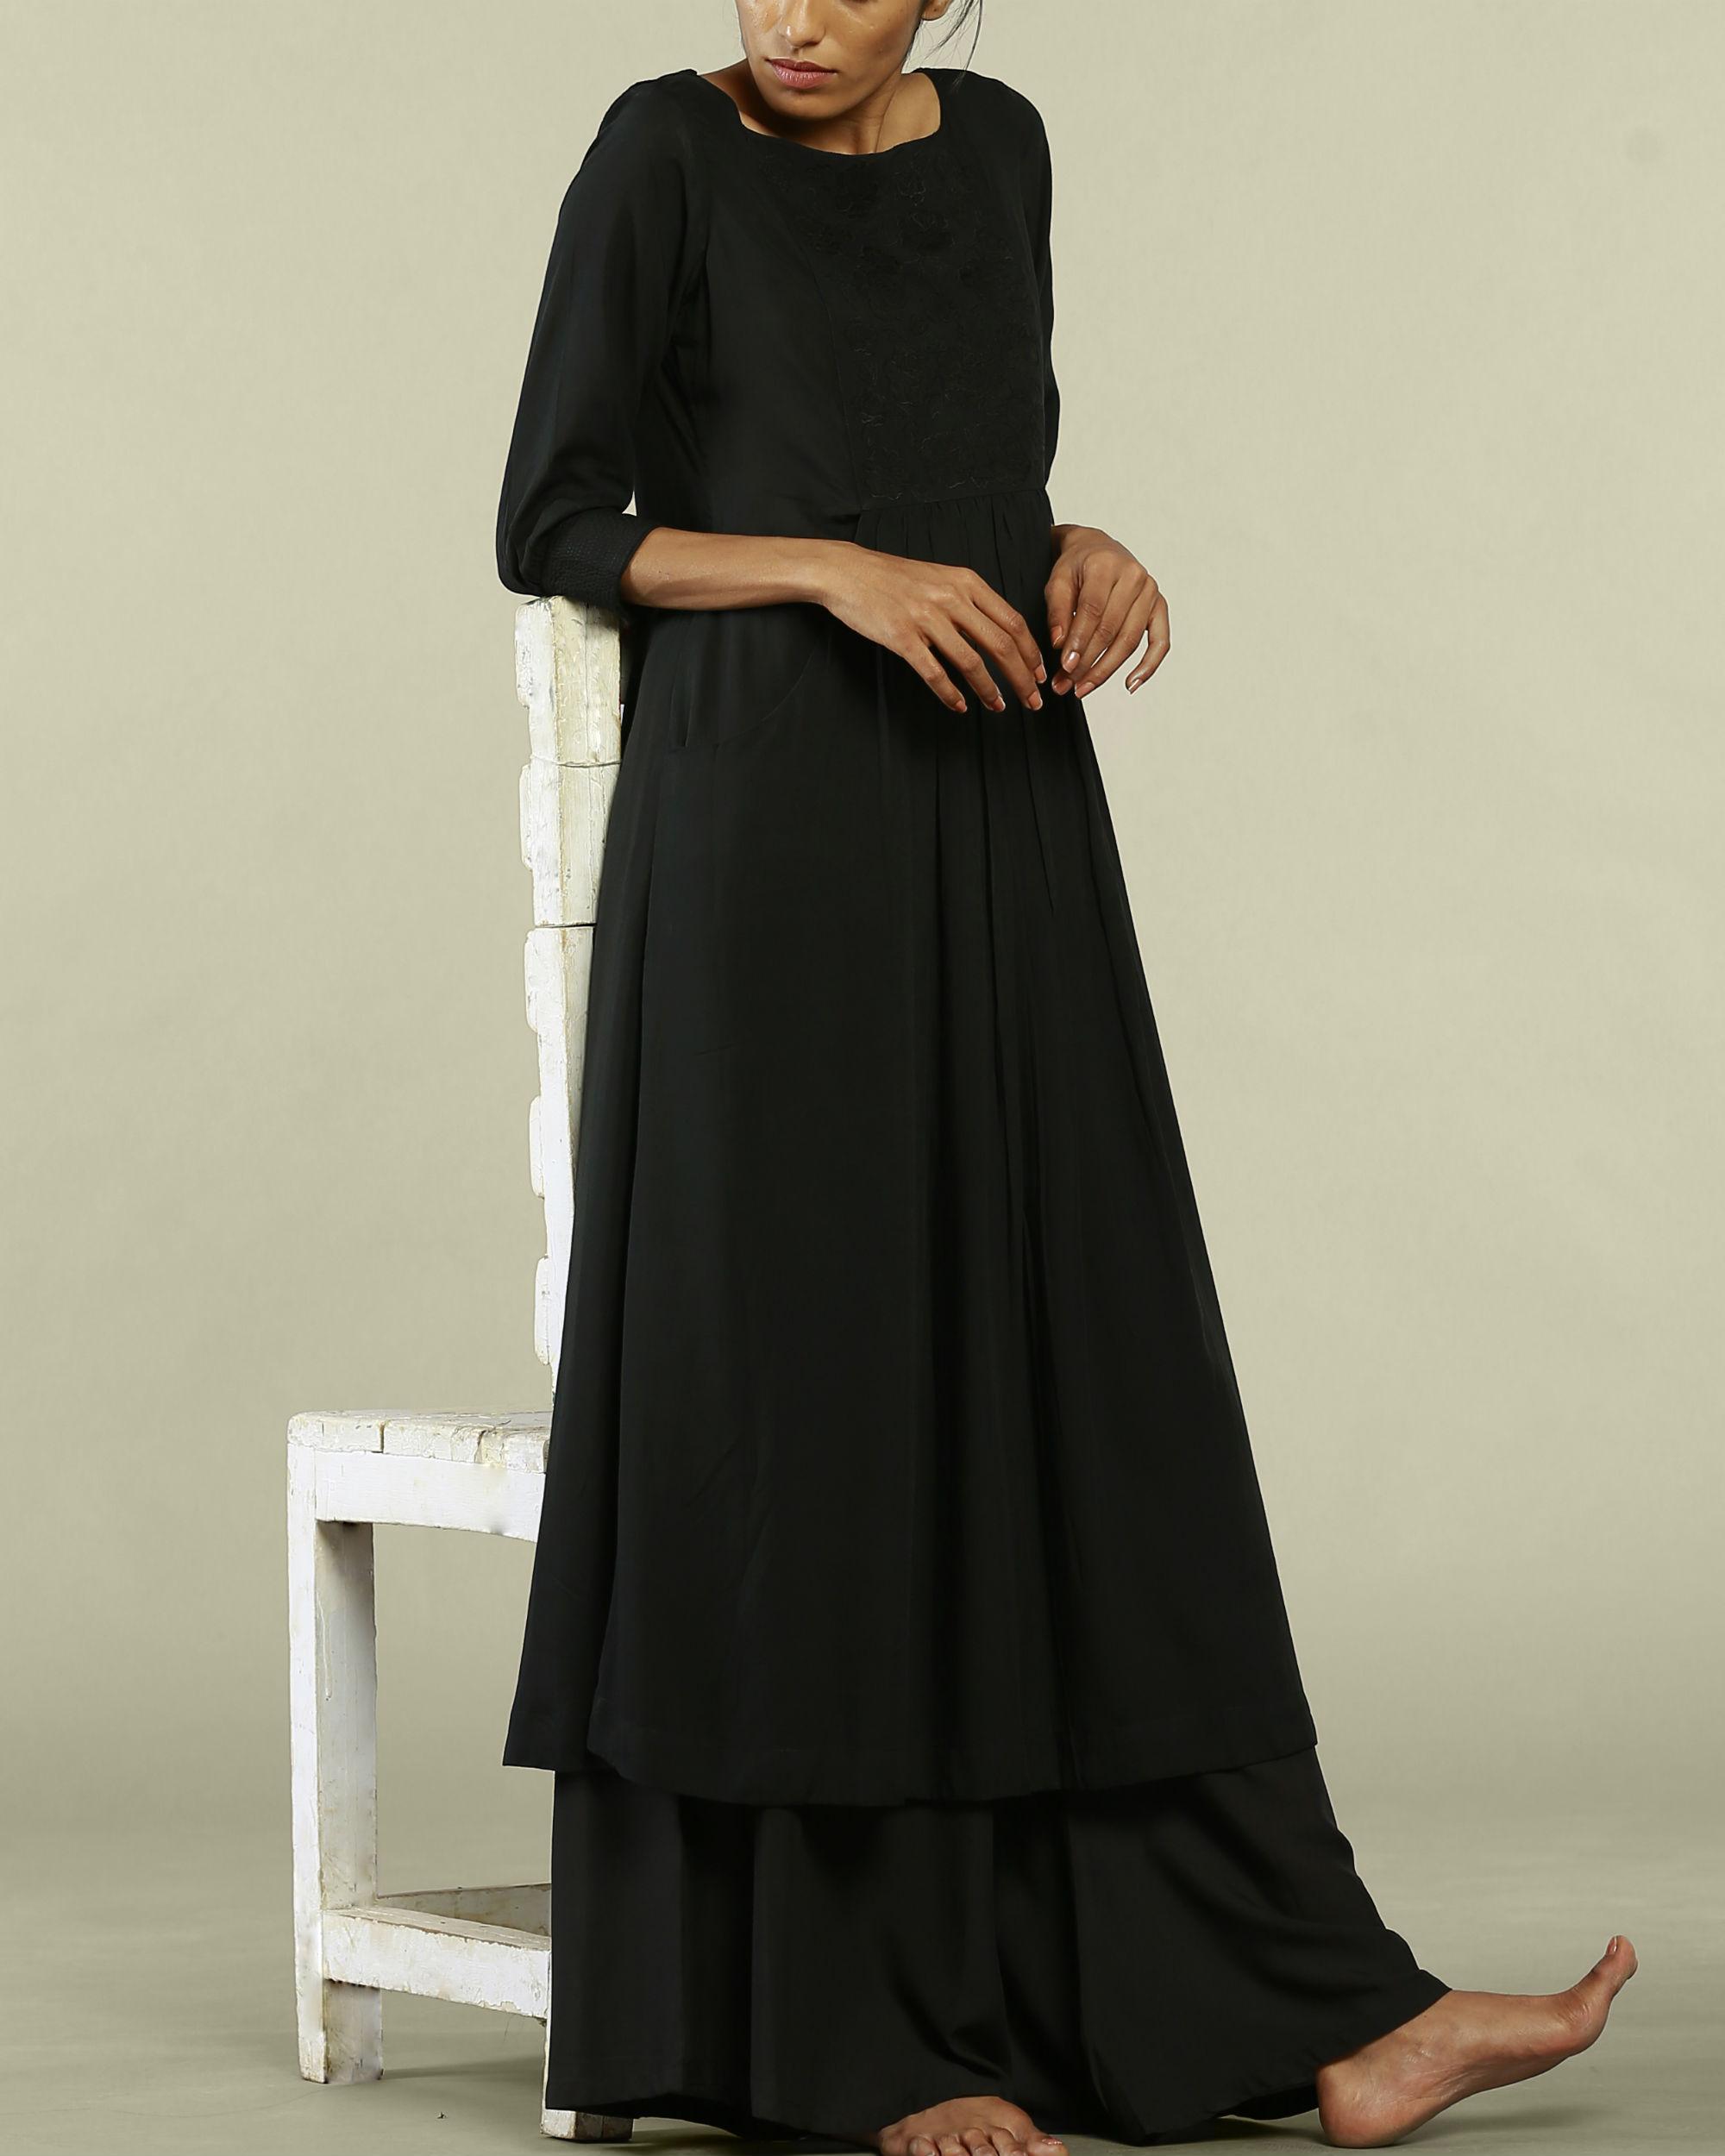 Black dress style tunic